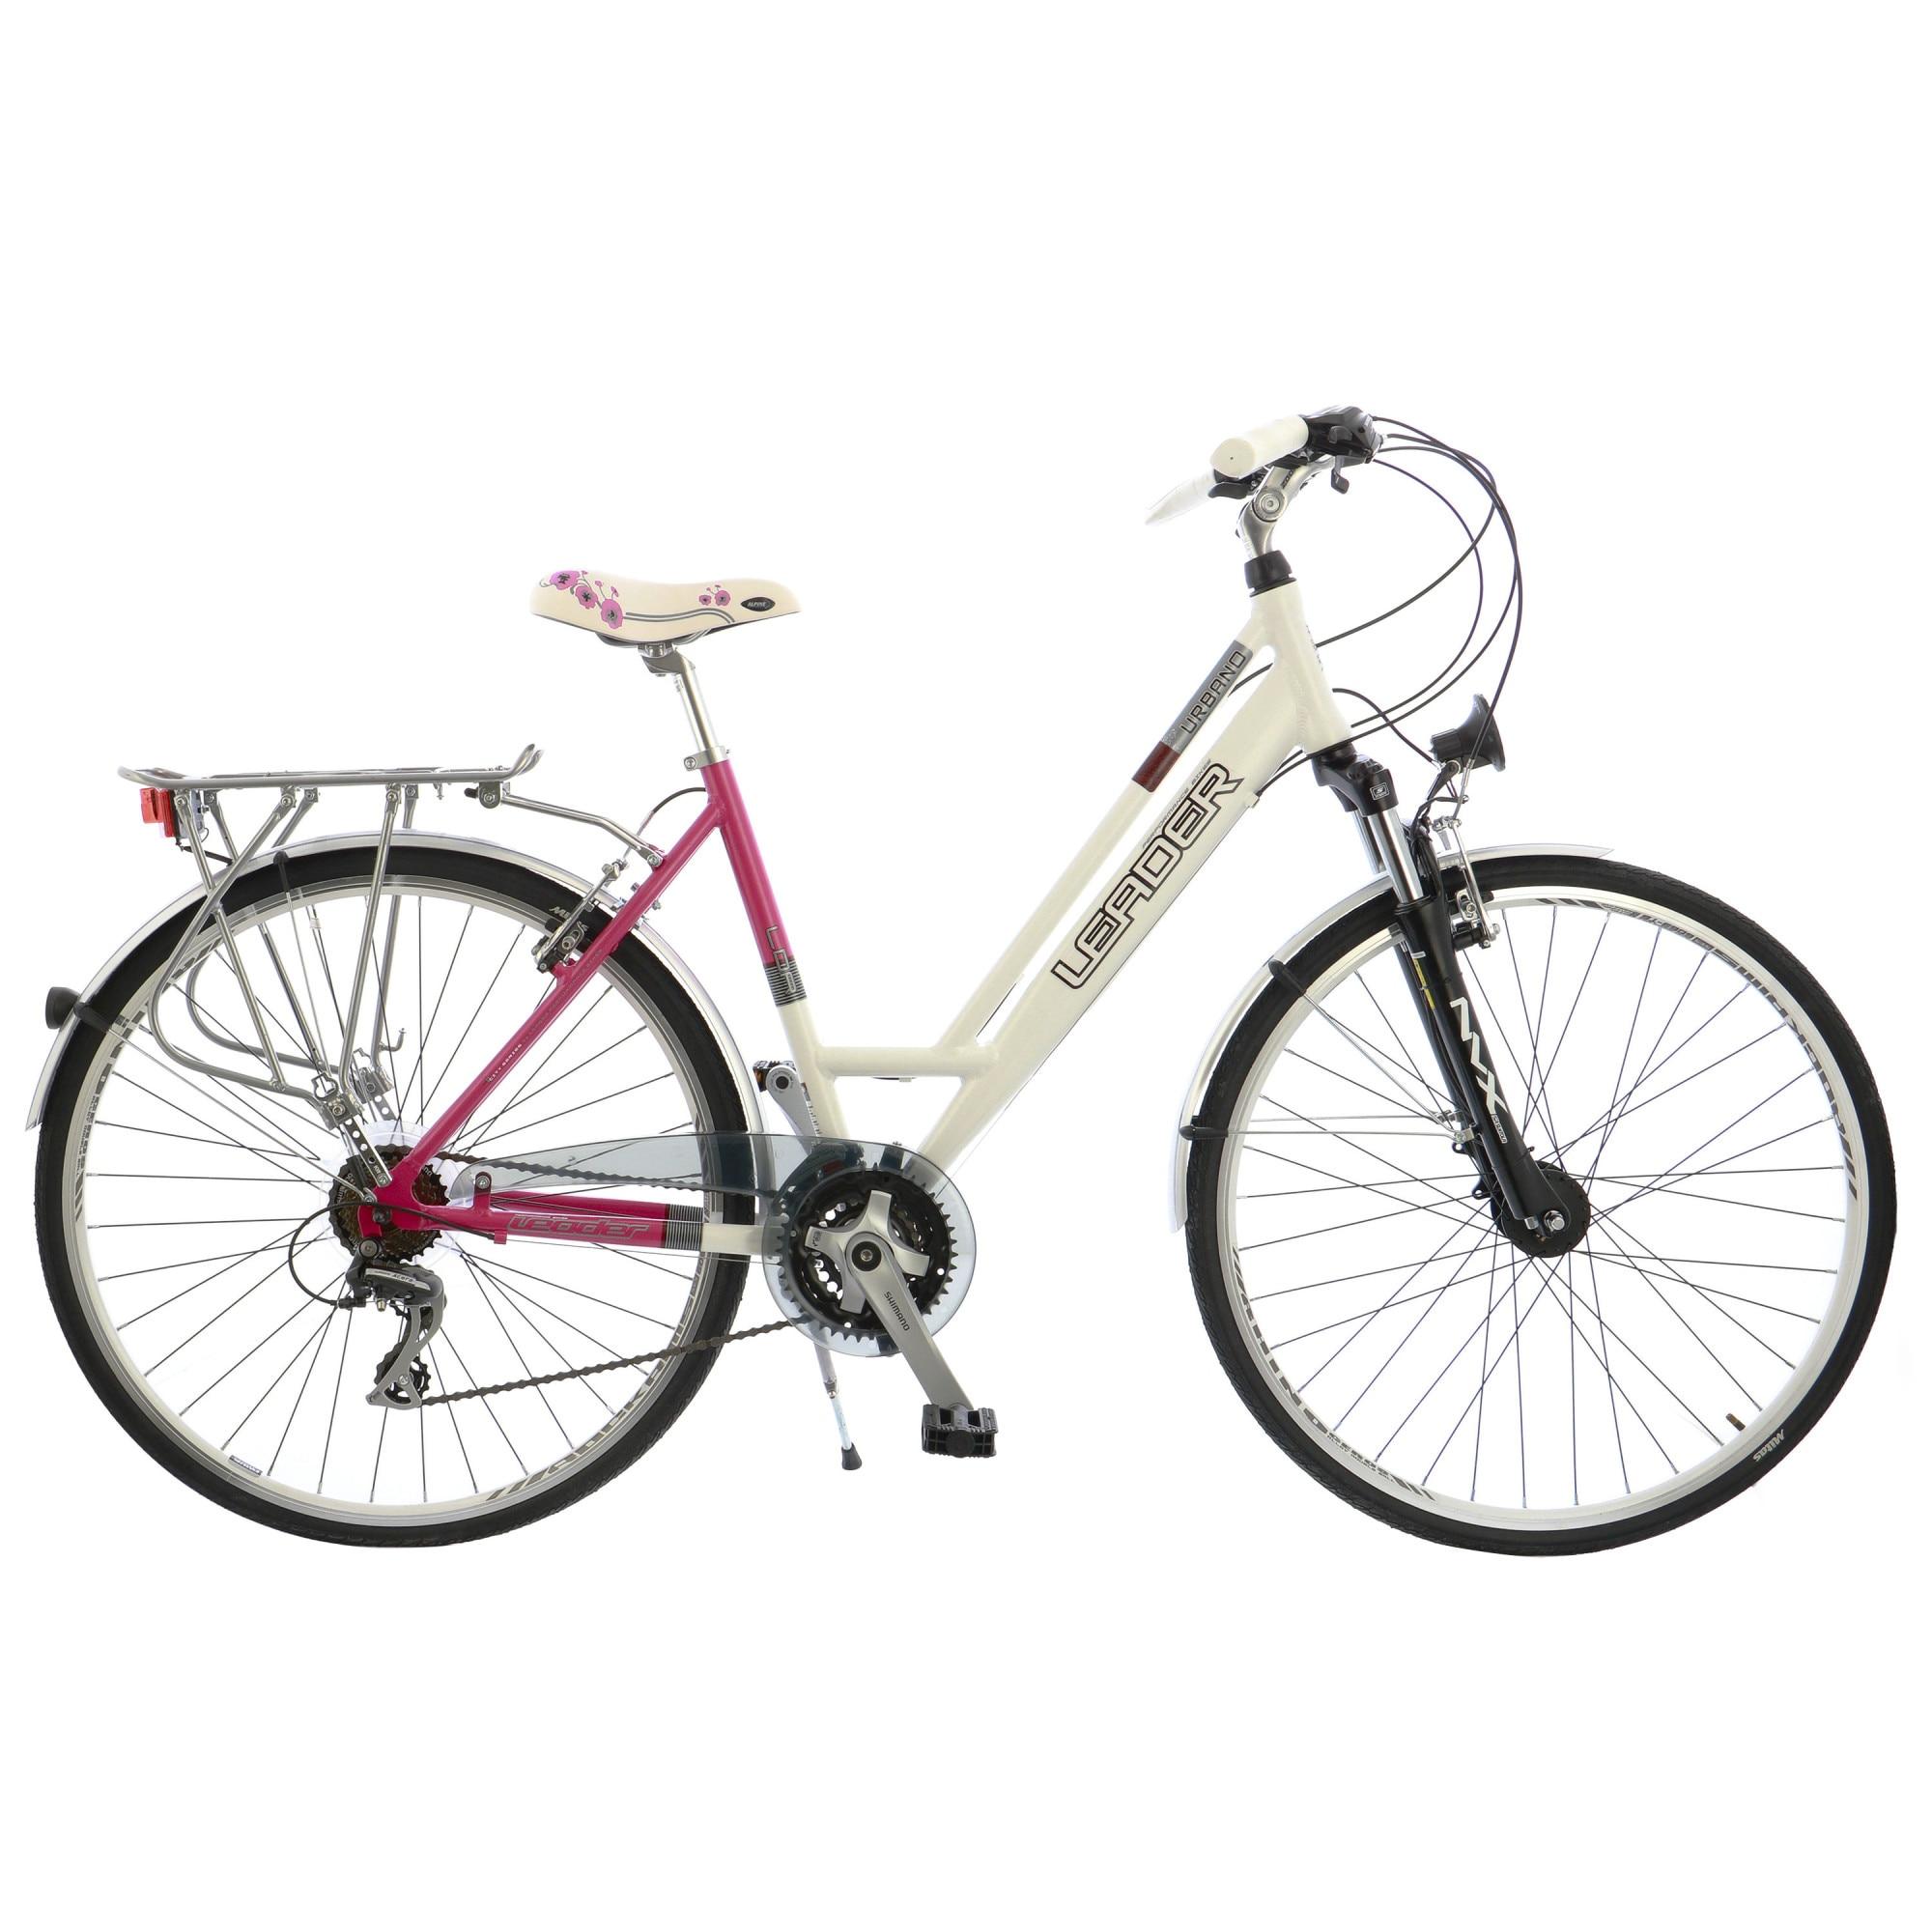 "Fotografie Bicicleta City 28"" Leader Urbano transmisie Shimano, furca Suntour NCX, cadru AL, 48cm, White/Pink"